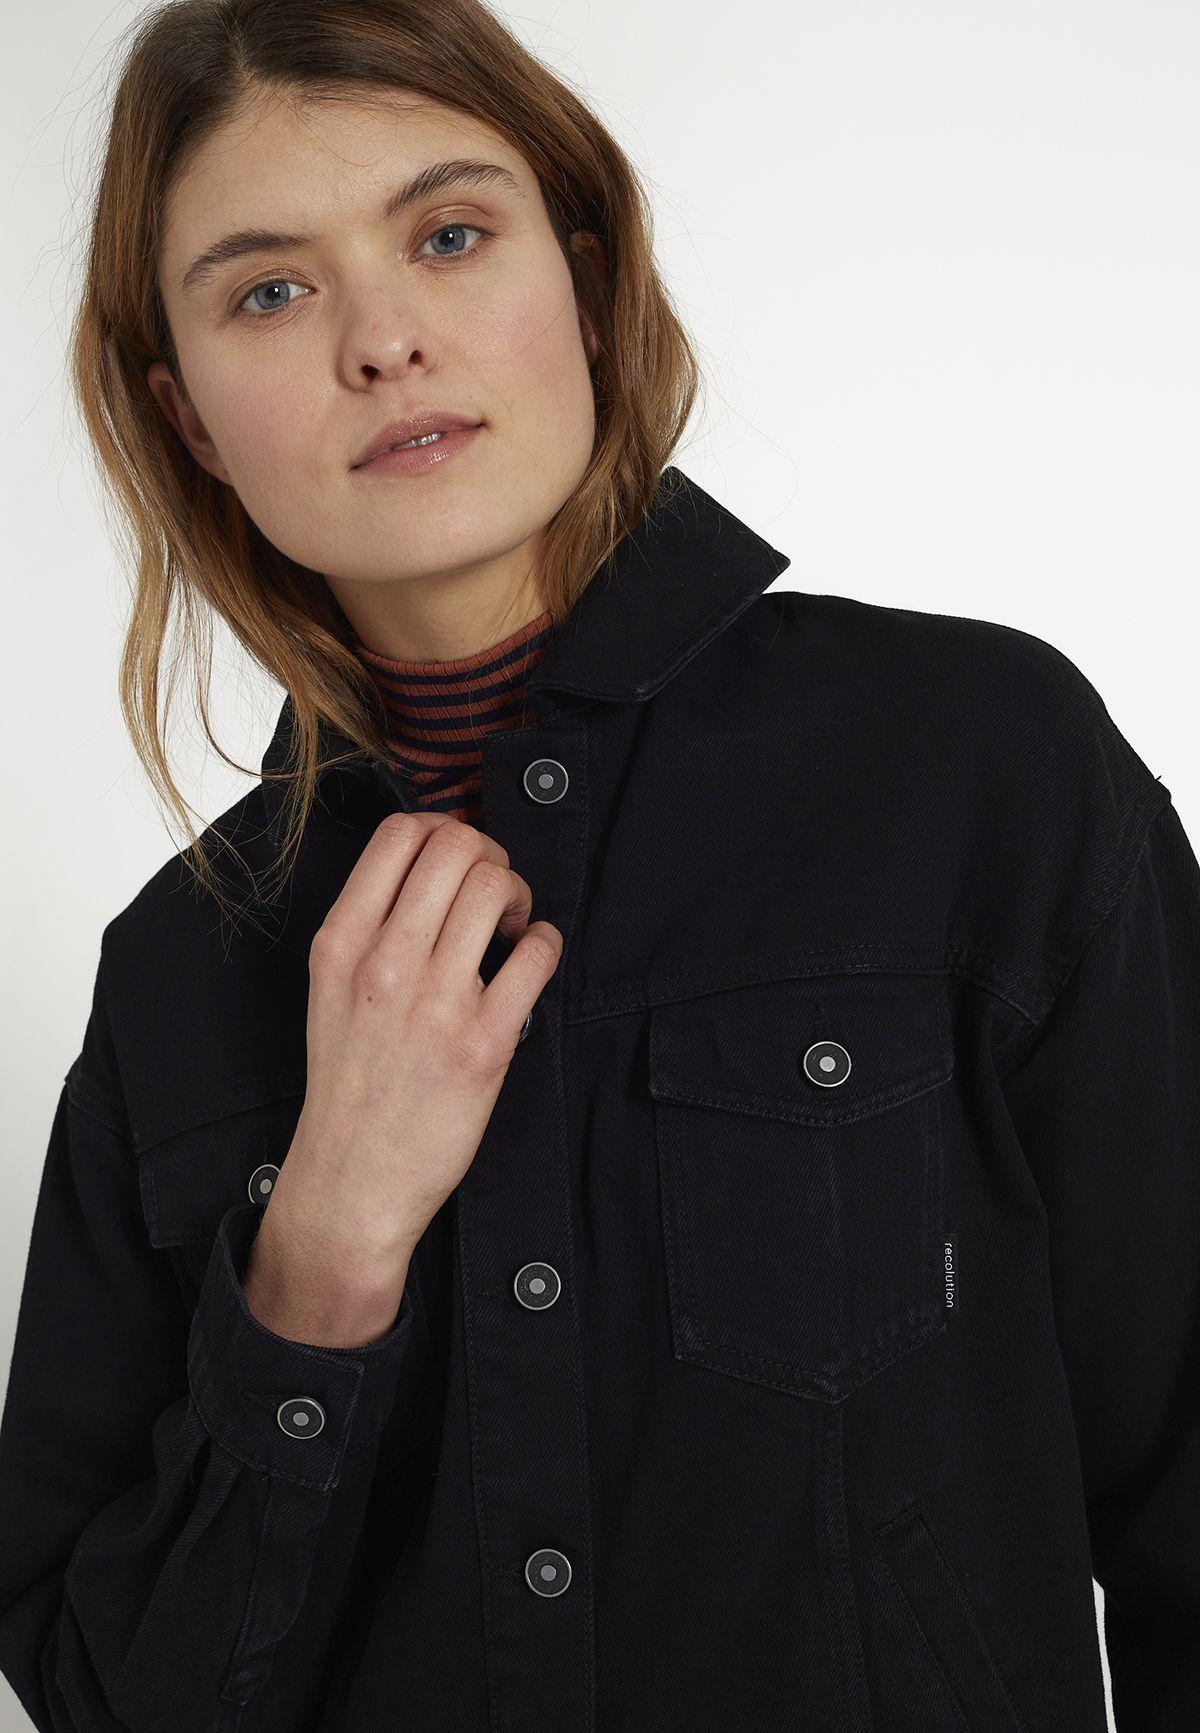 Damen-Jeansjacke SISSOO washed black